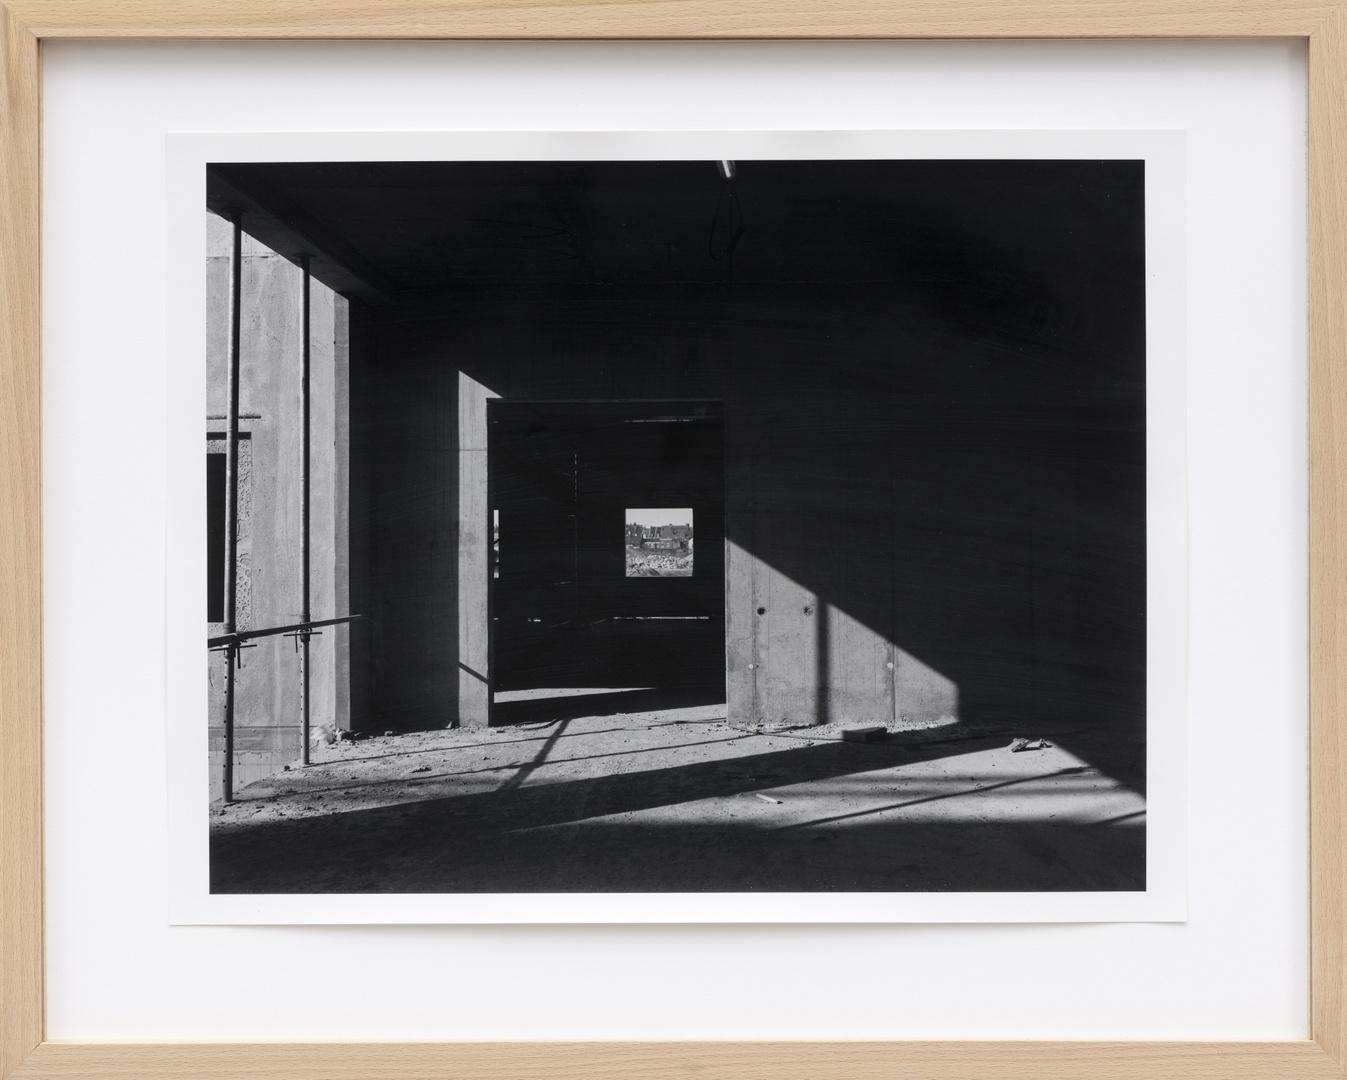 Bouw Bonnefantenmuseum 1992-1994 ; Binnentuin zuid